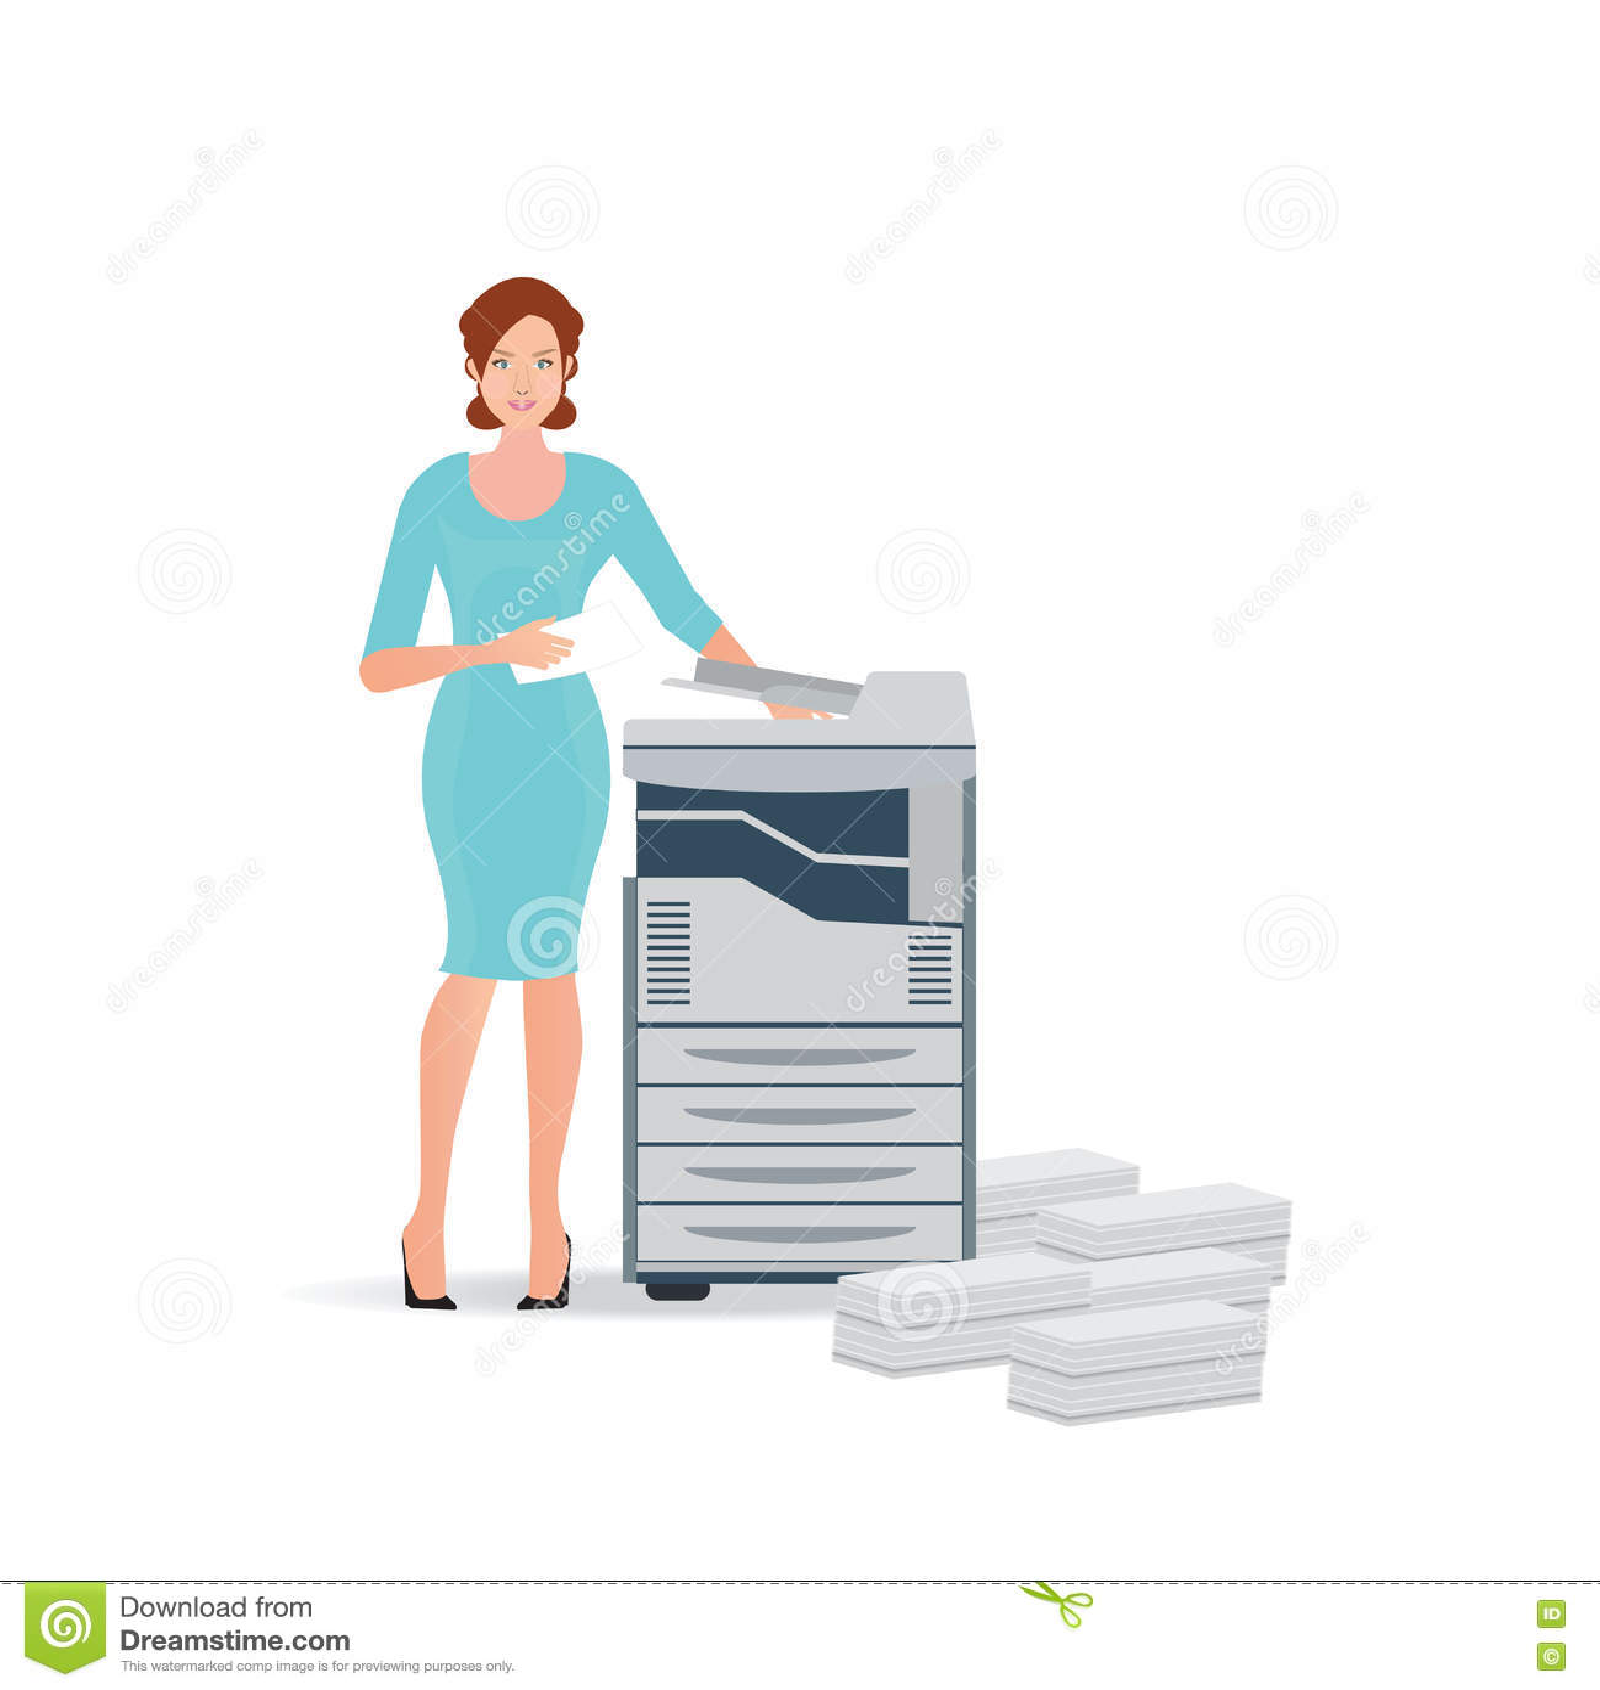 Fax Clip Printer Machine Art